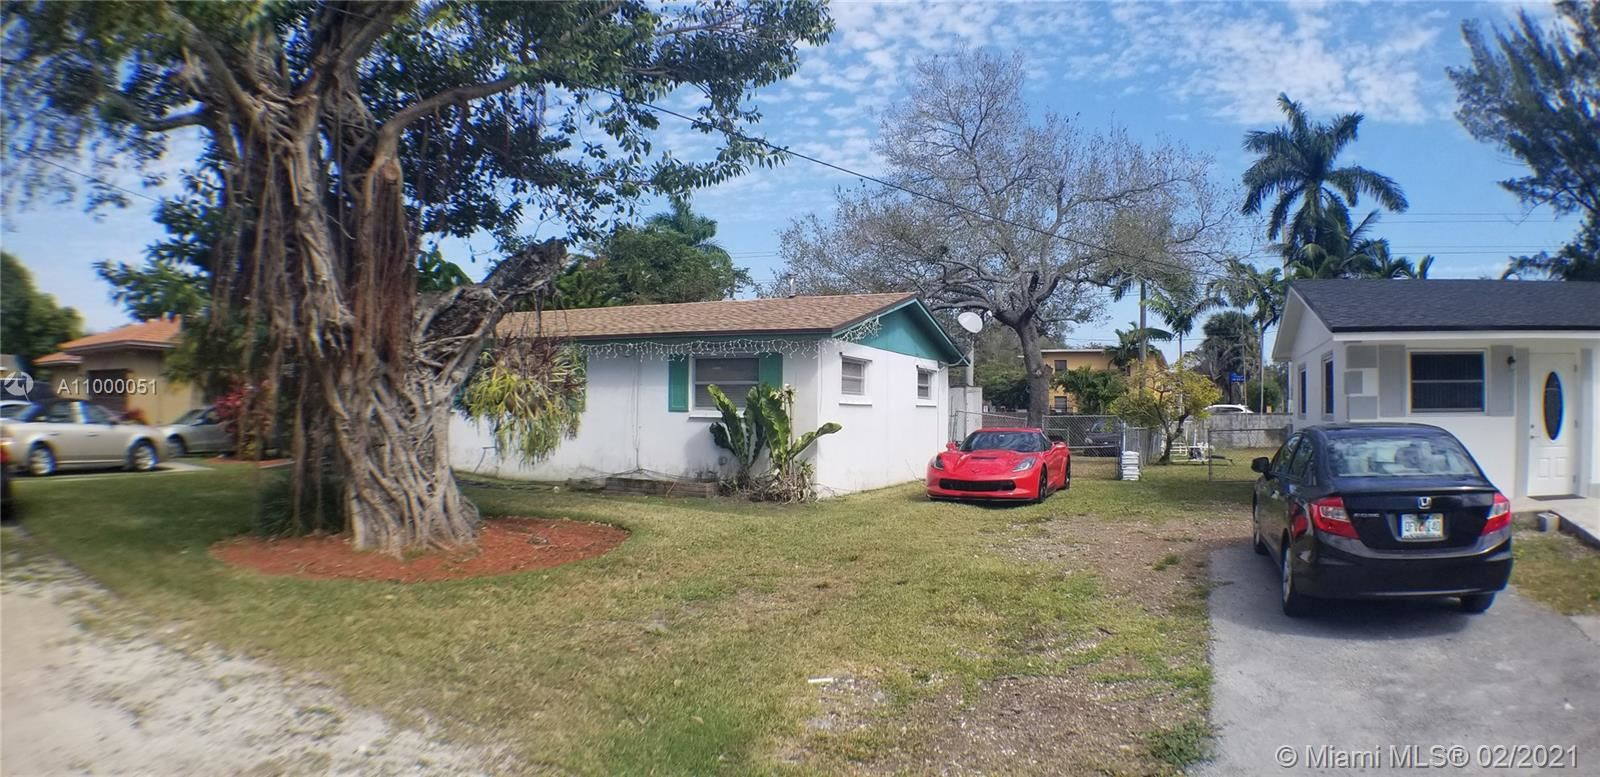 Photo of South Miami, FL 33143 (MLS # A11000051)